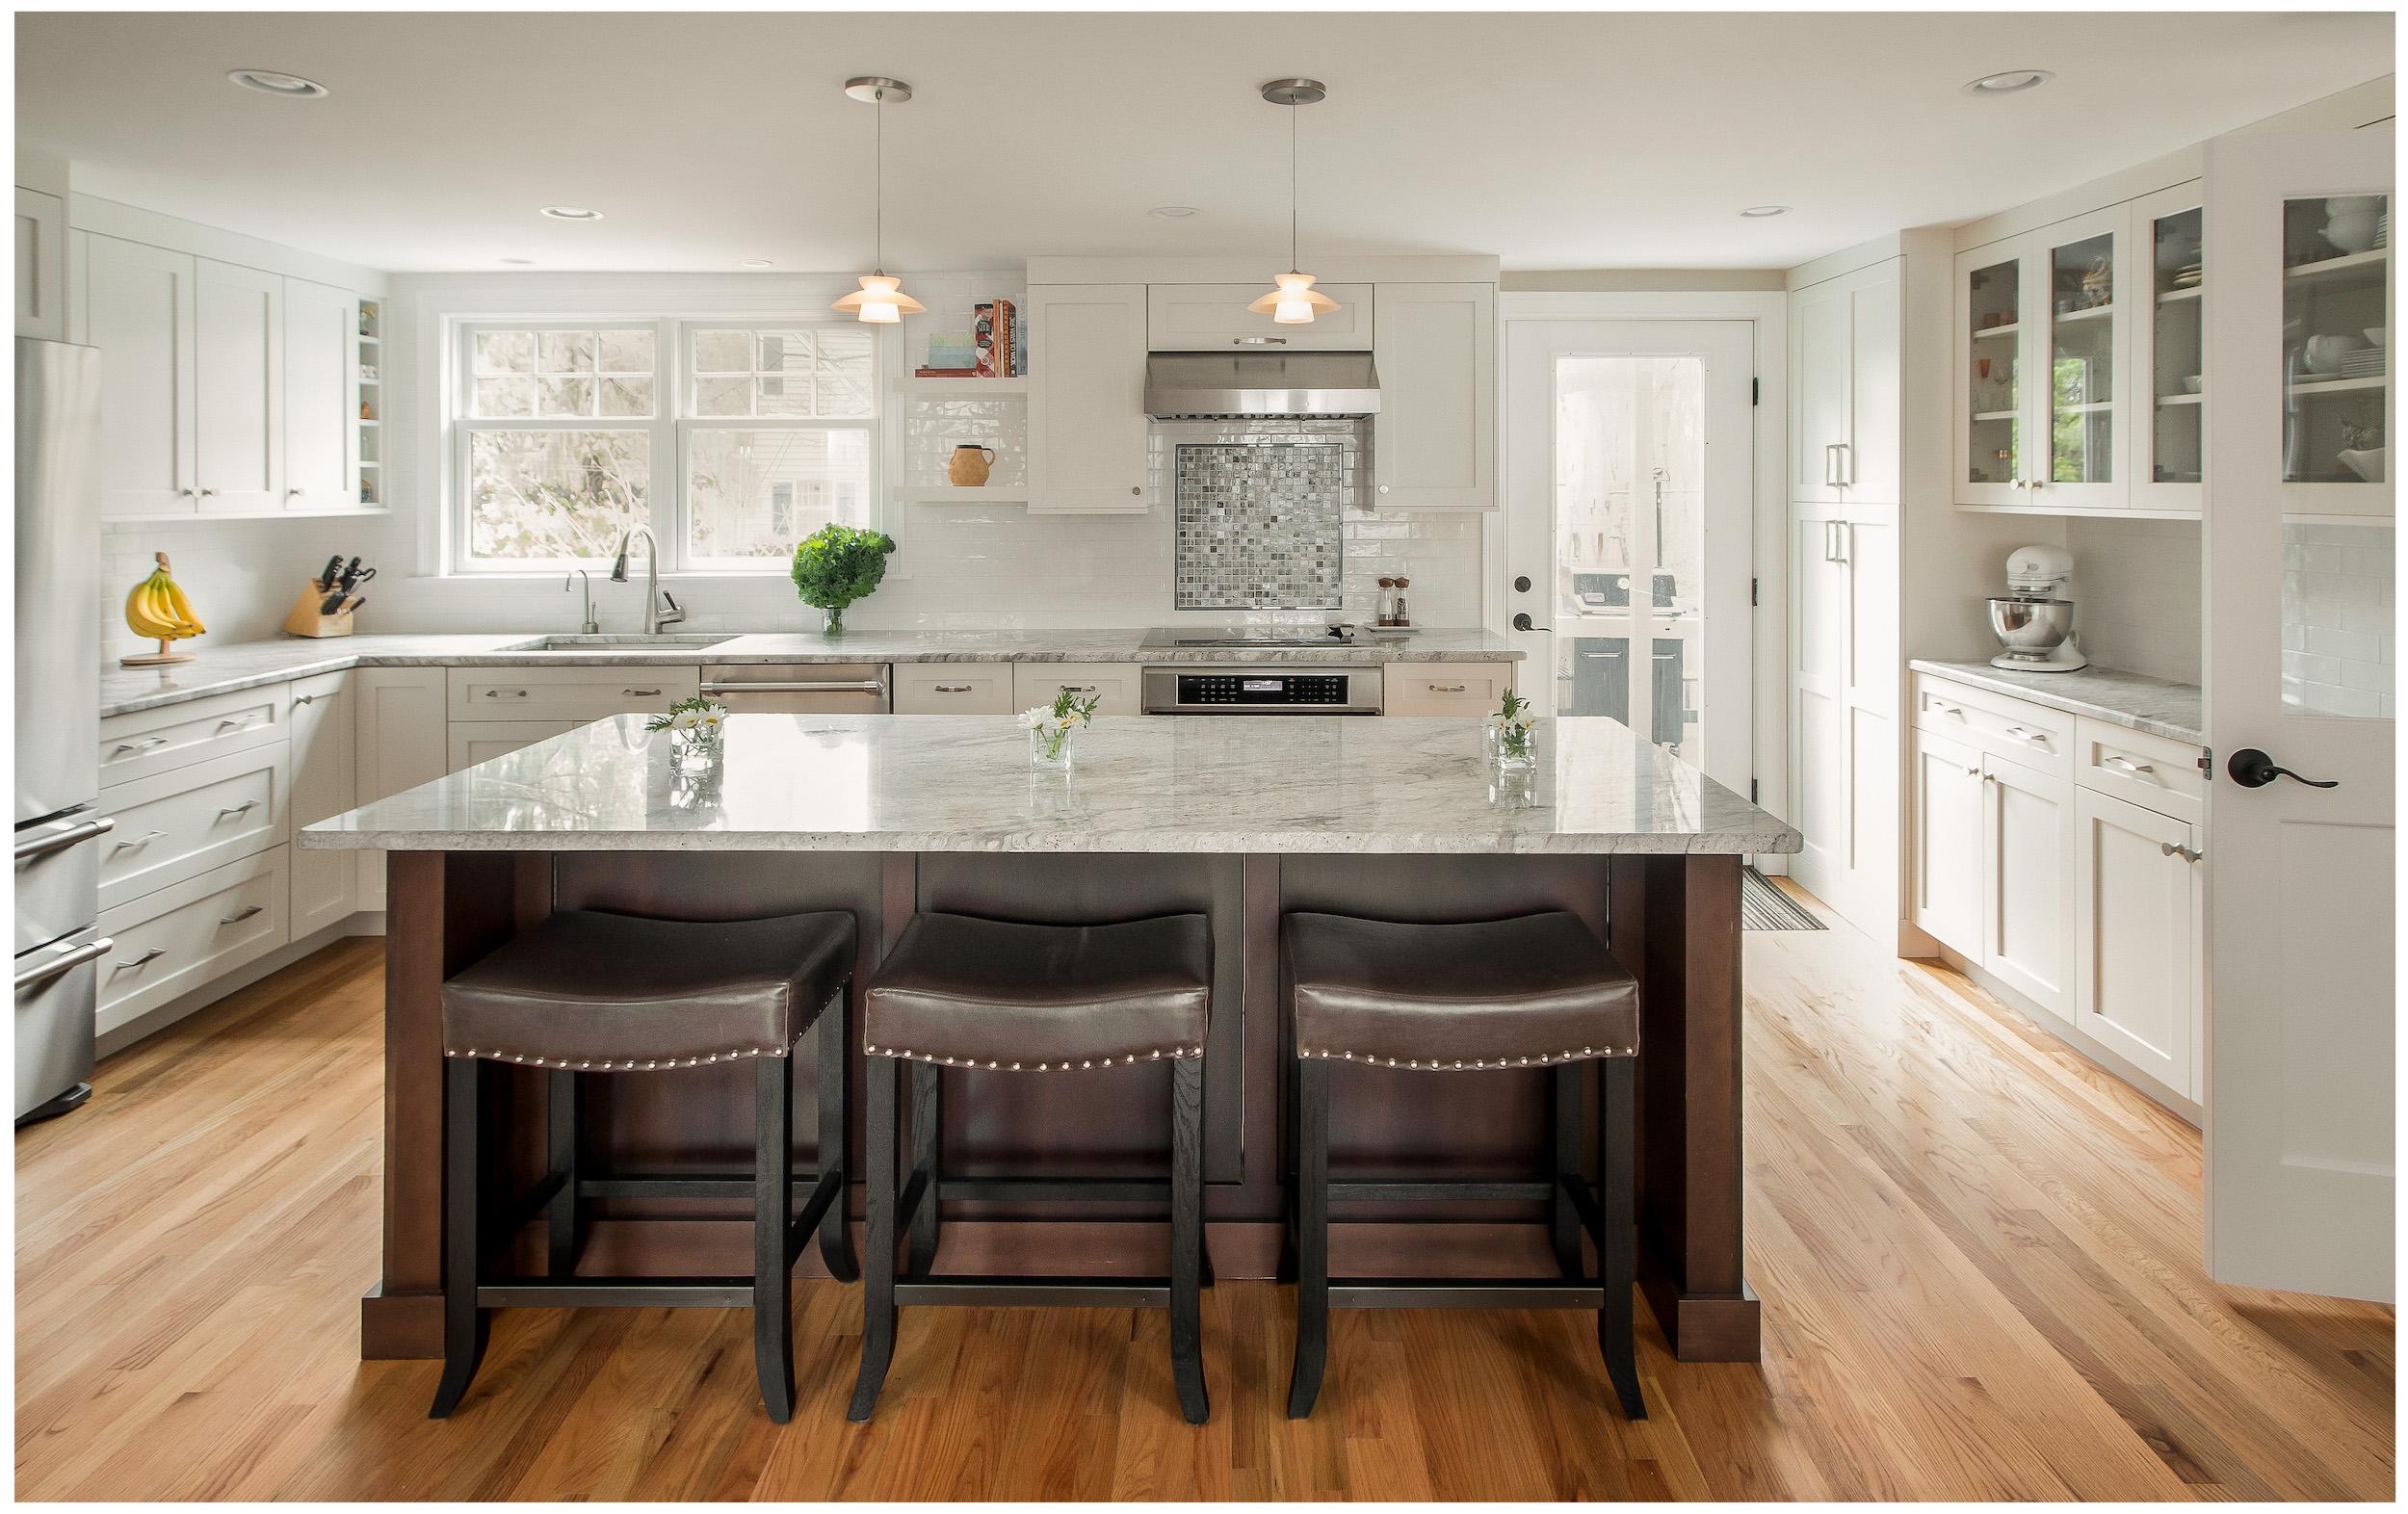 KitchenVisions-New-Traditional-Kitchen-Newton-1.jpg